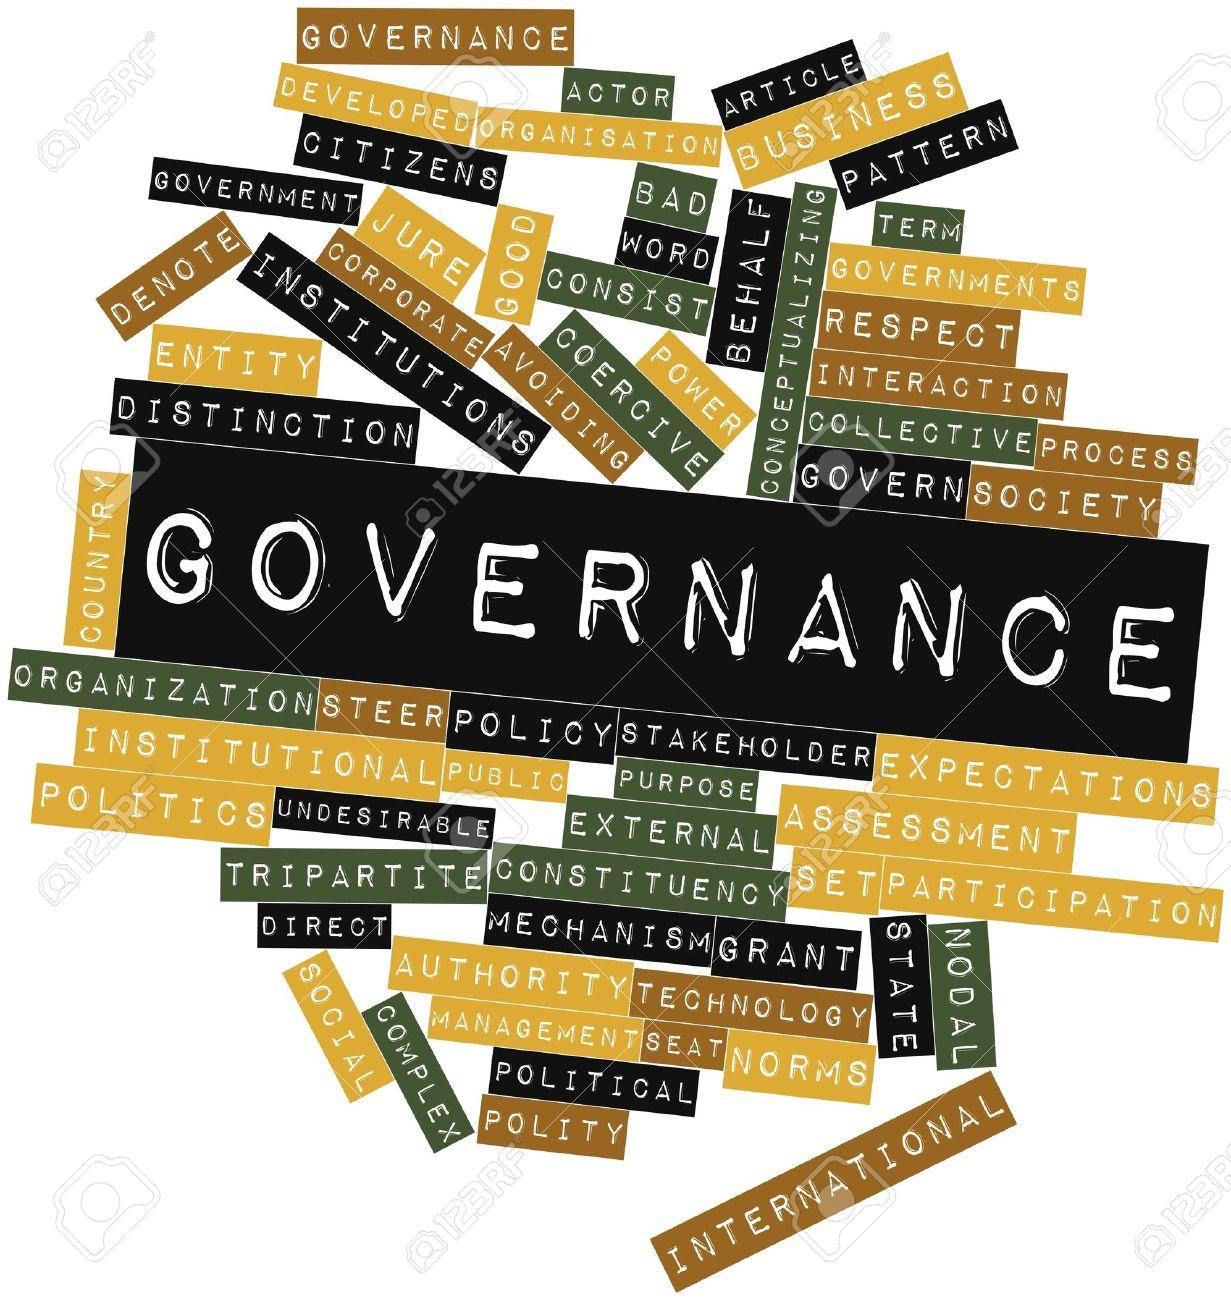 Governance clipart.